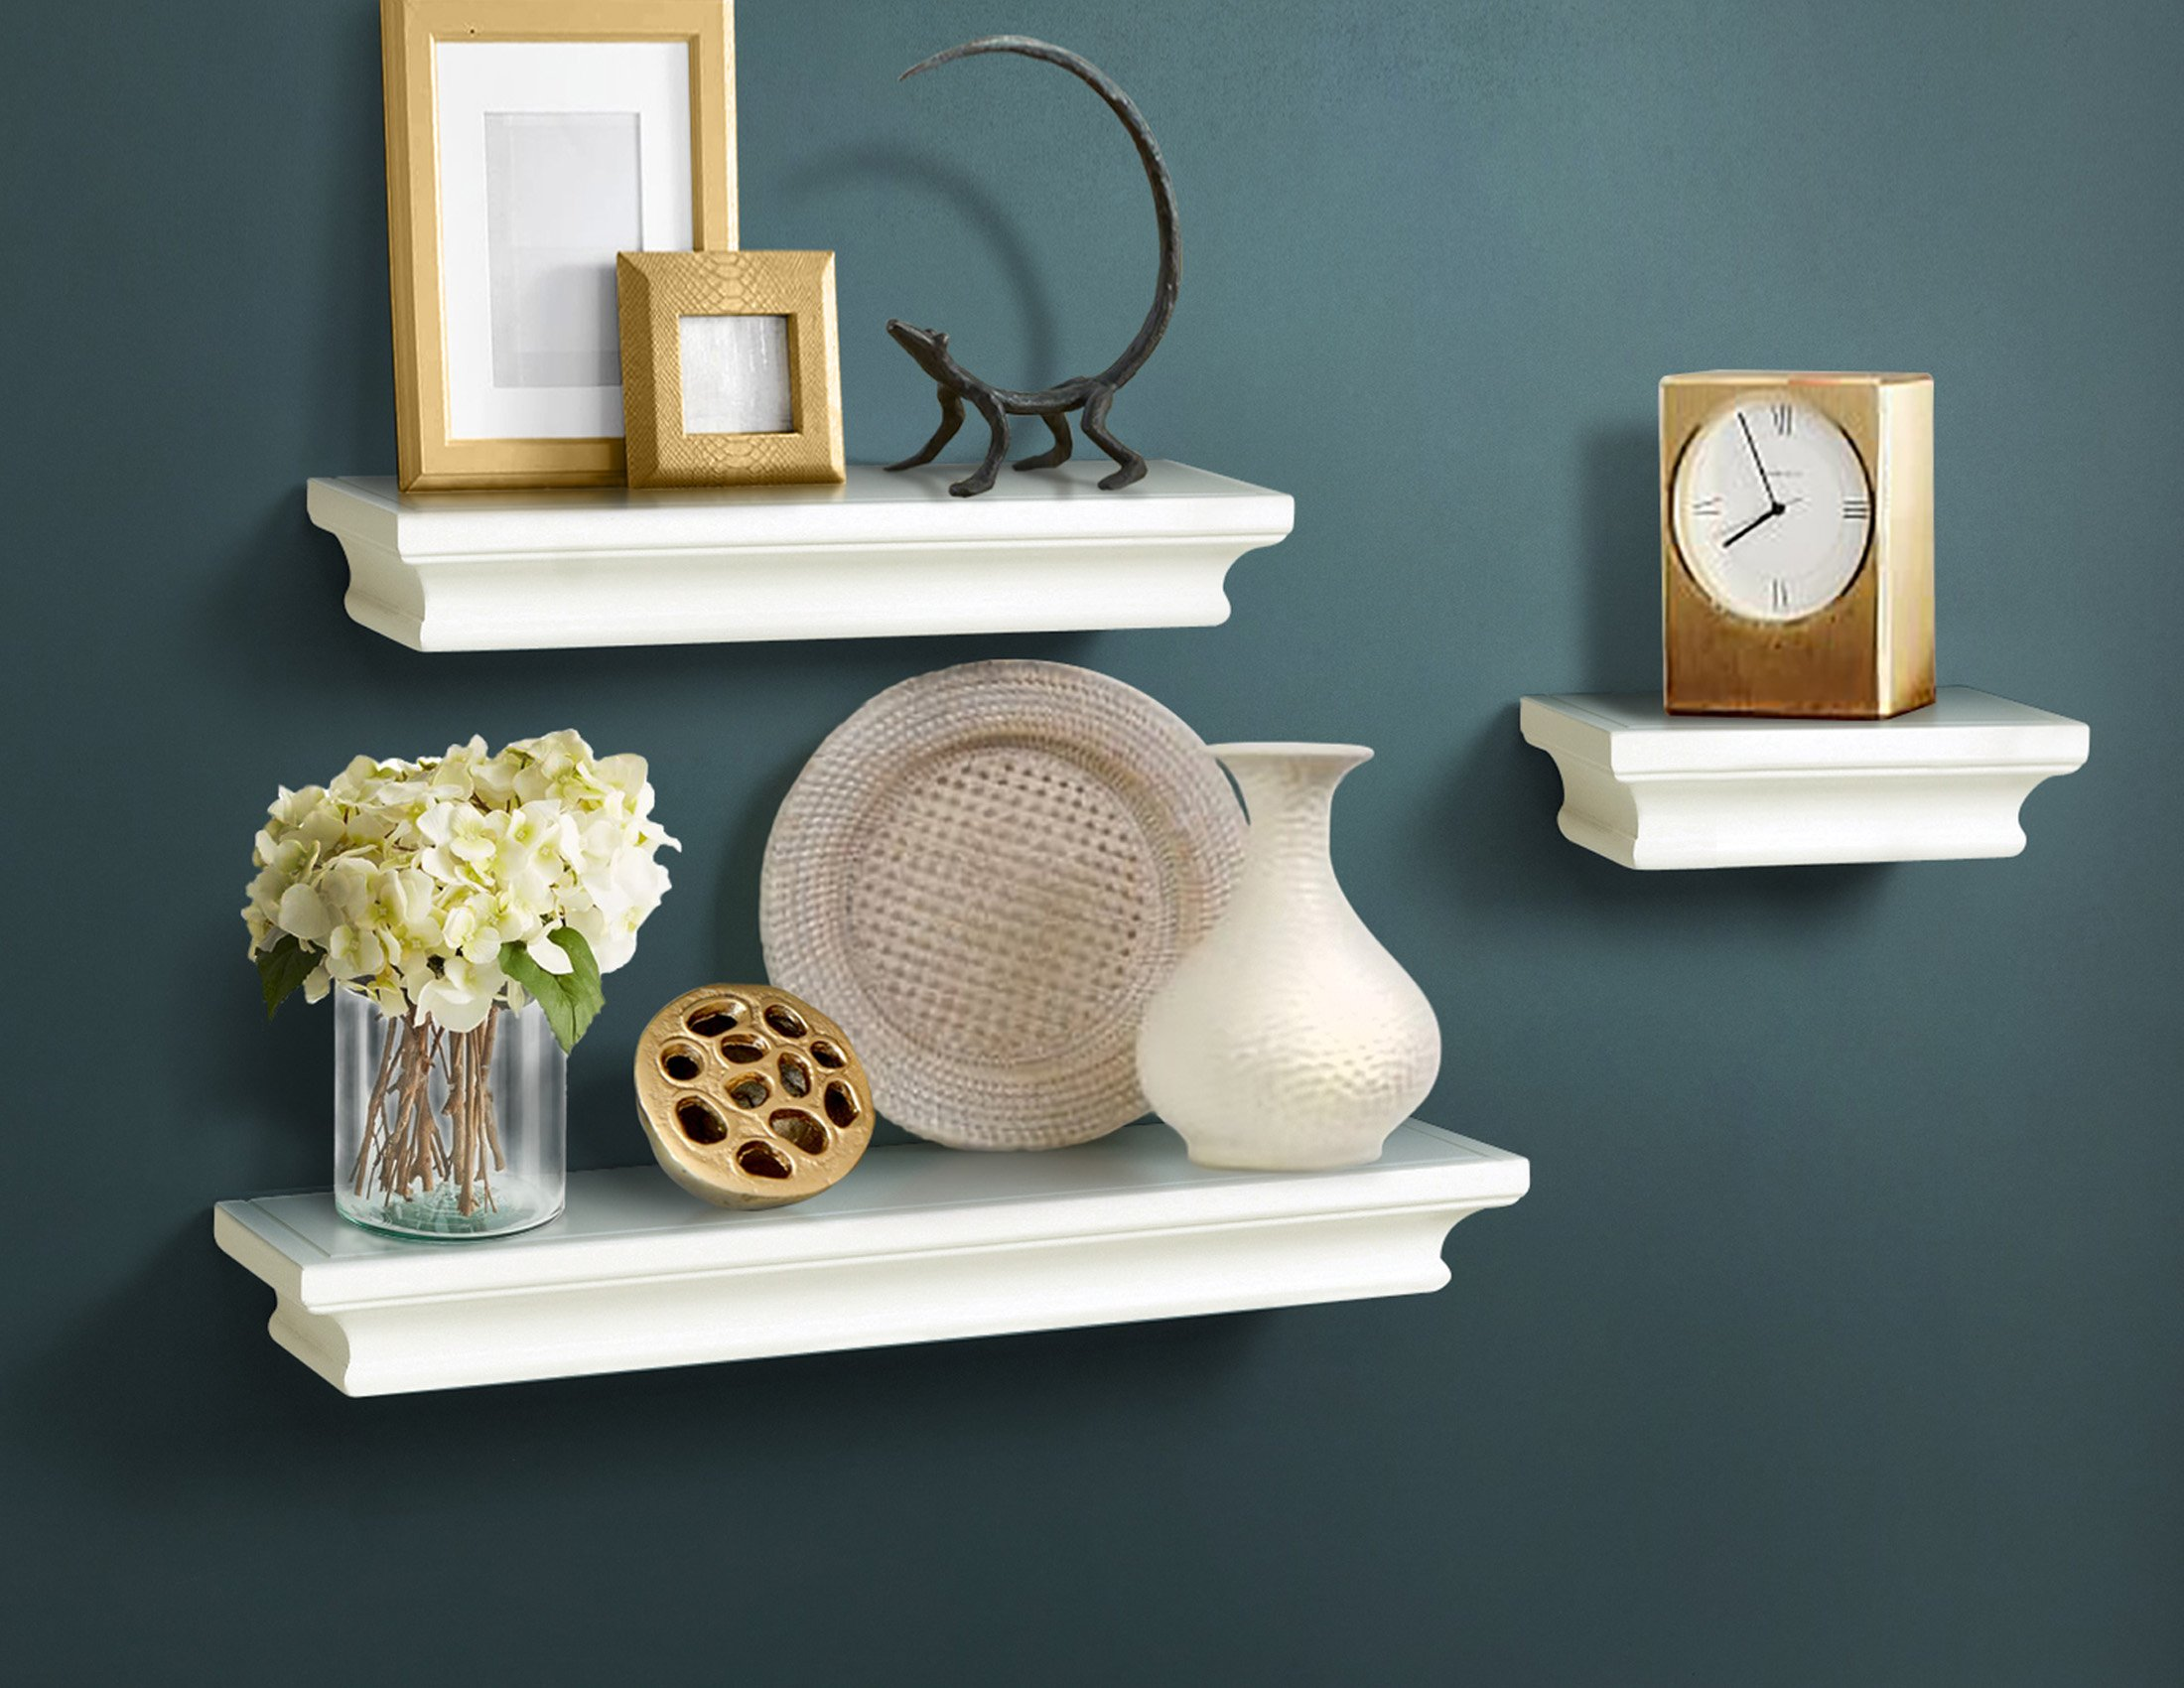 AHDECOR White Floating Shelves, Ledge Wall Shelf for Home Decor with 4'' Deep, Set of 3 pcs